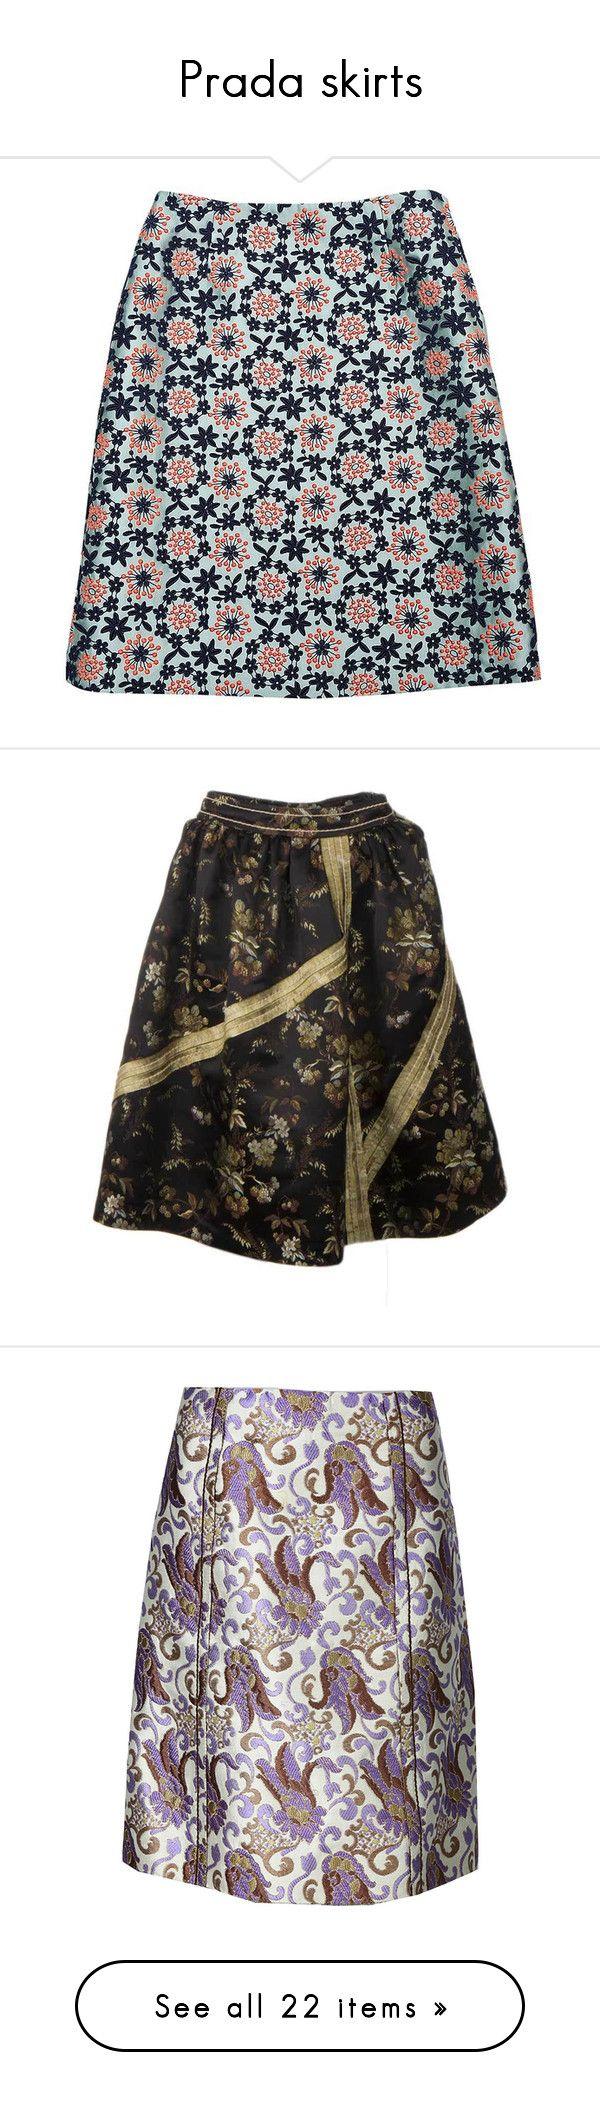 """Prada skirts"" by missloveschic ❤ liked on Polyvore featuring skirts, prada, prada skirt, black knee length skirt, black skirt, tulip skirt, green skirt, beige skirt, yellow skirt and a line skirt"